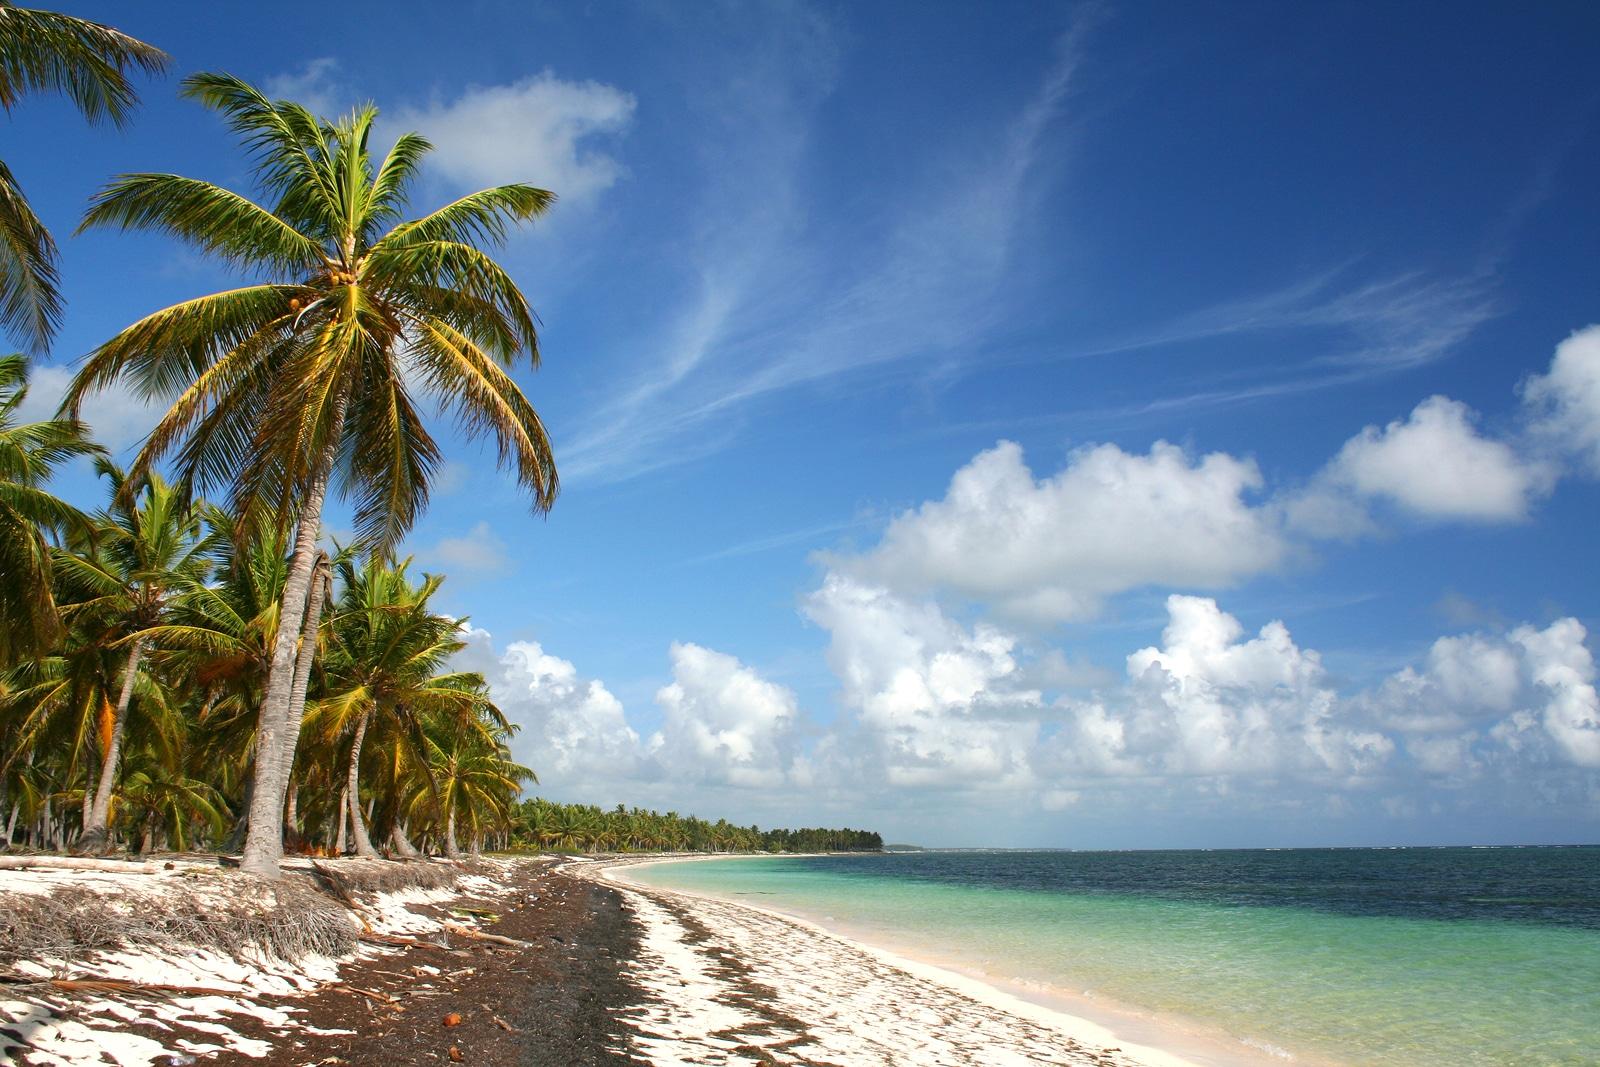 Sitios de buceo en Cozumel